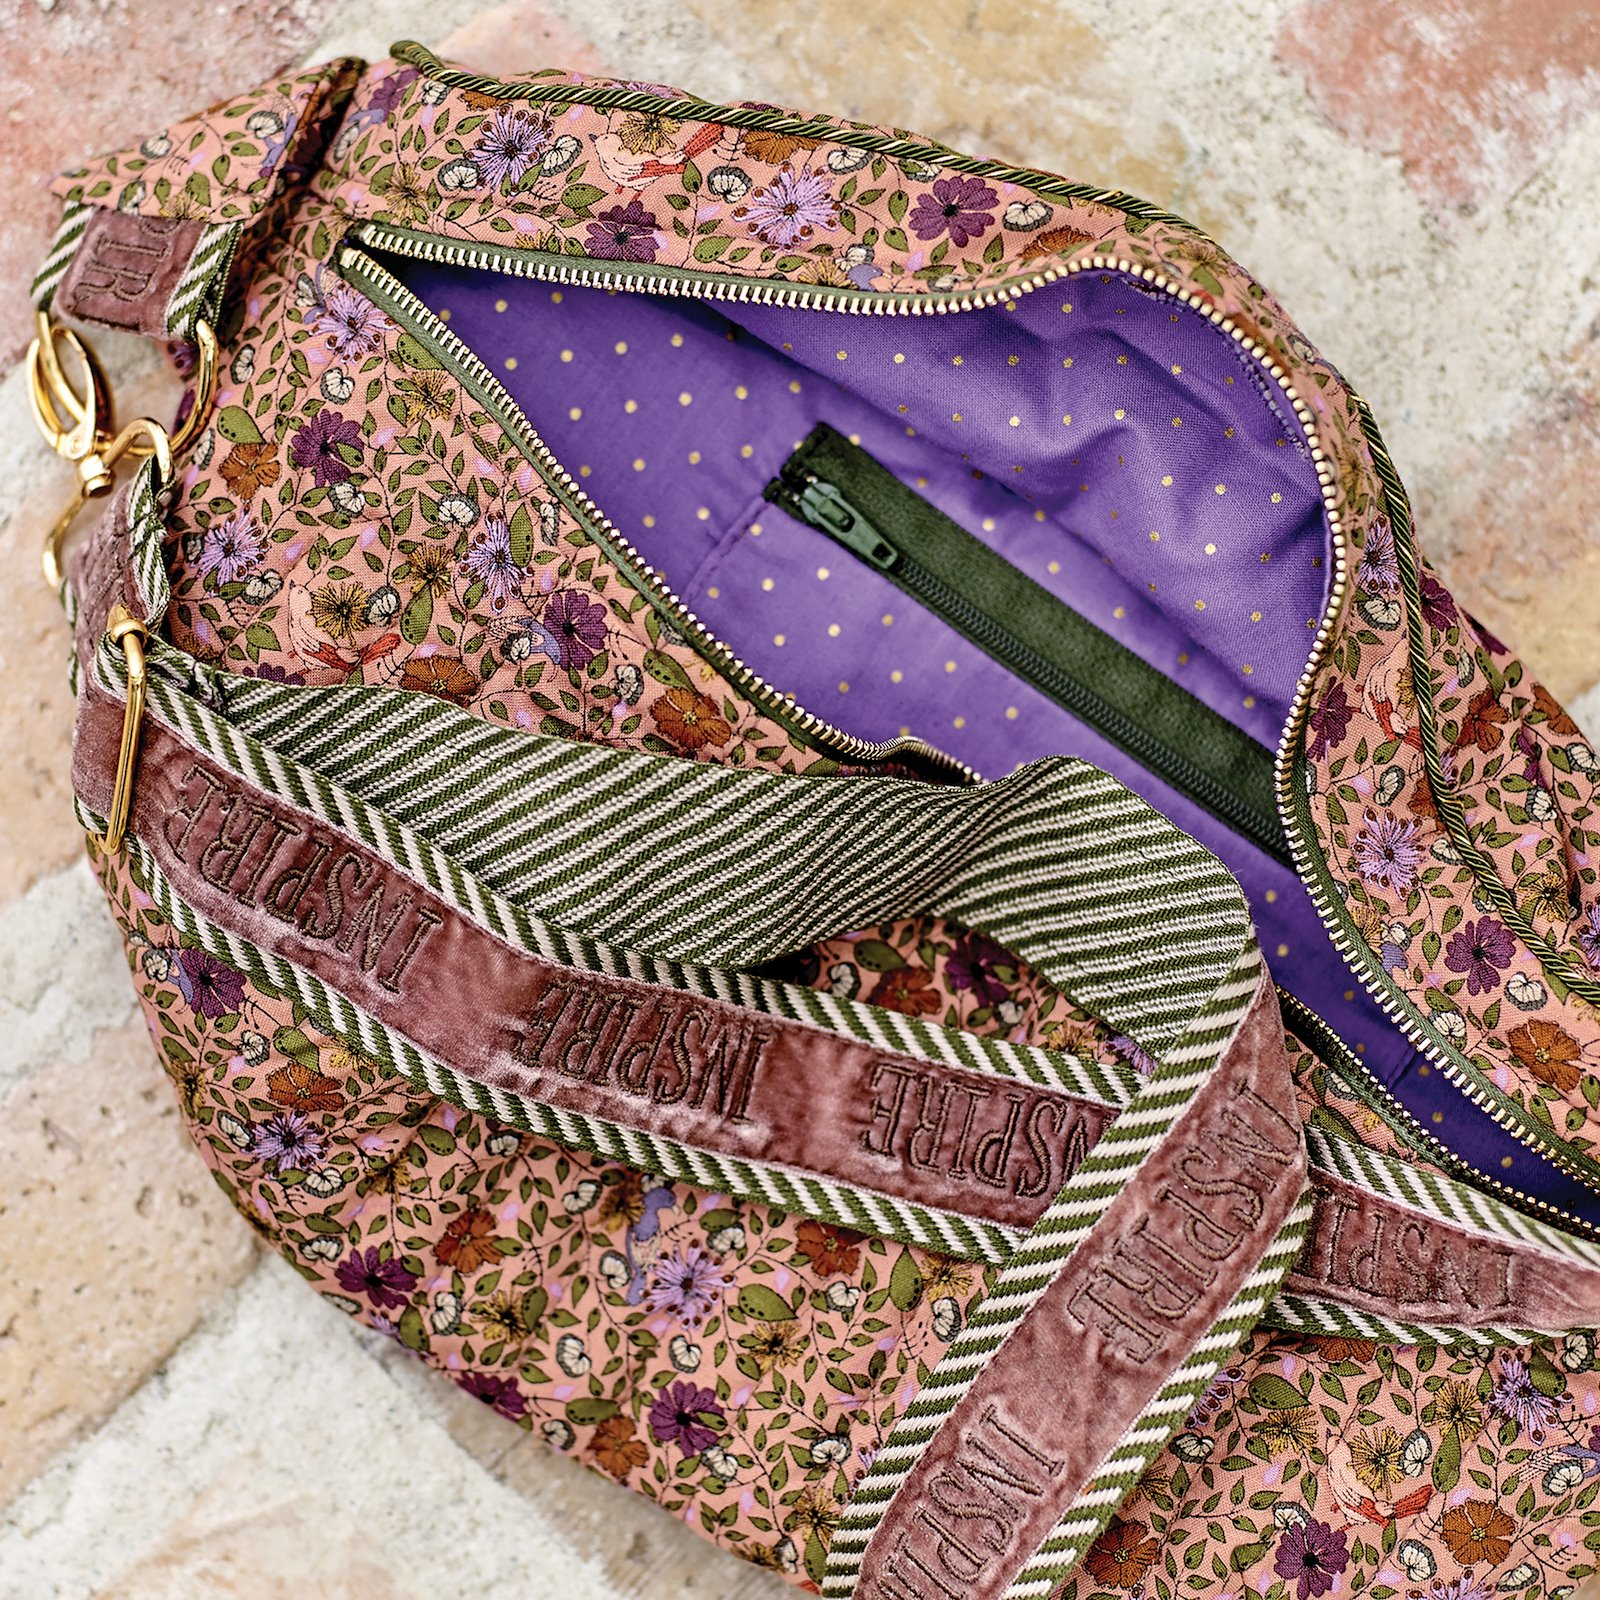 Cotton dark lavendel with gold dots p90330_852348_852352_21449_21457_71148_sskit